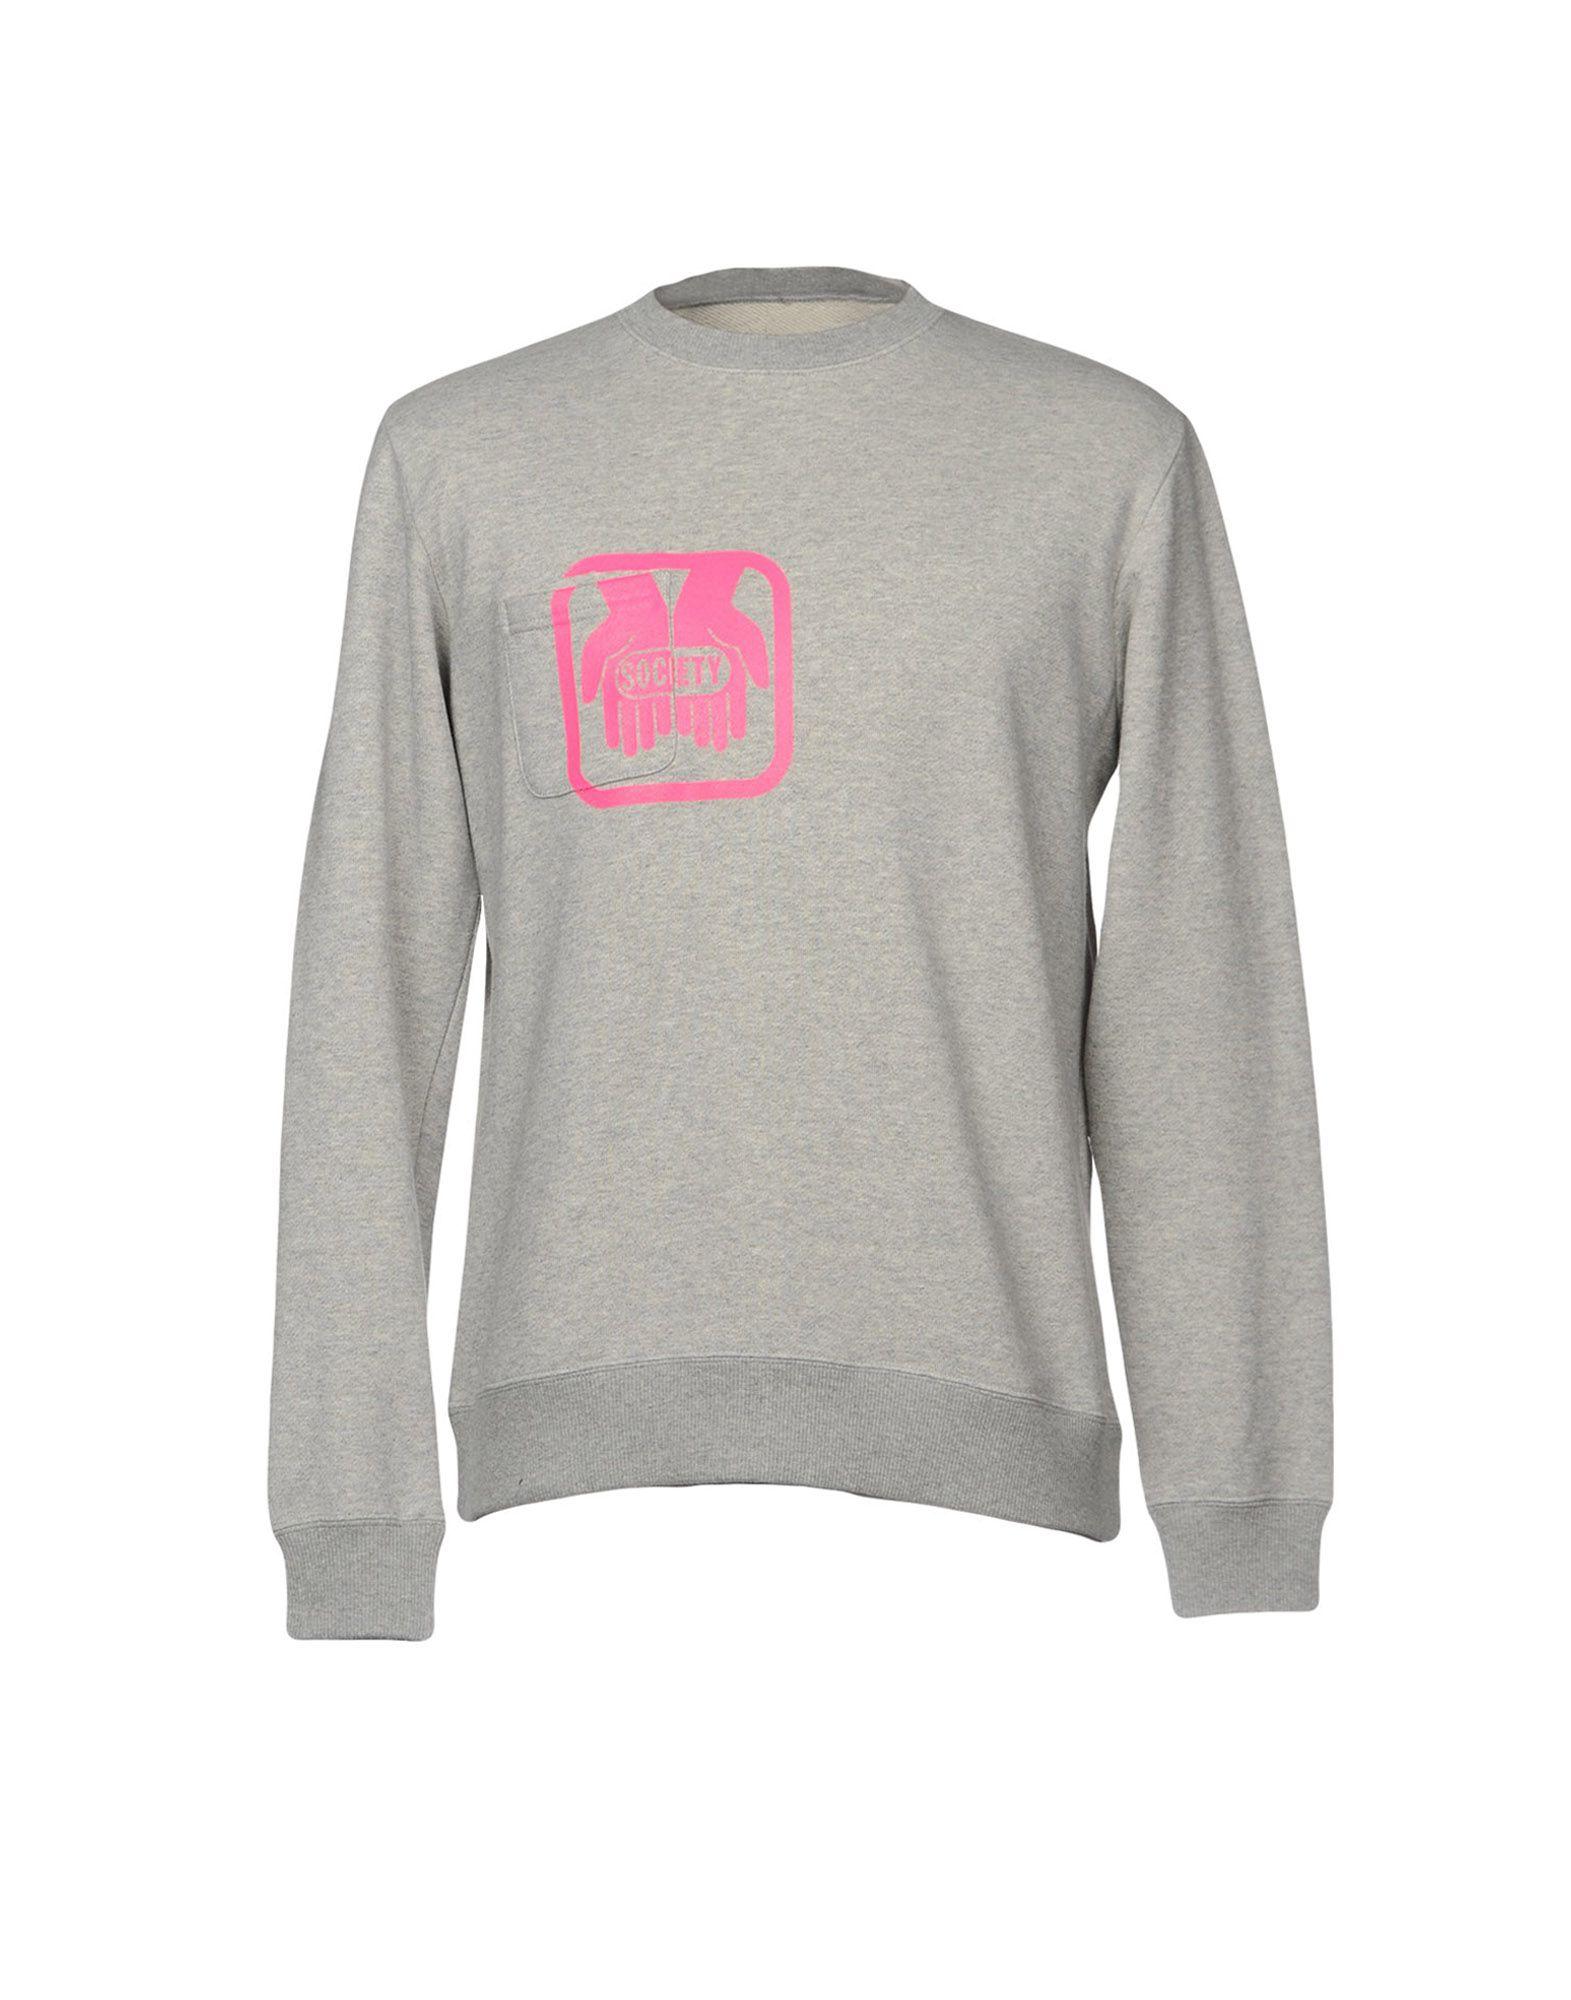 SOCIETY Sweatshirt in Grey